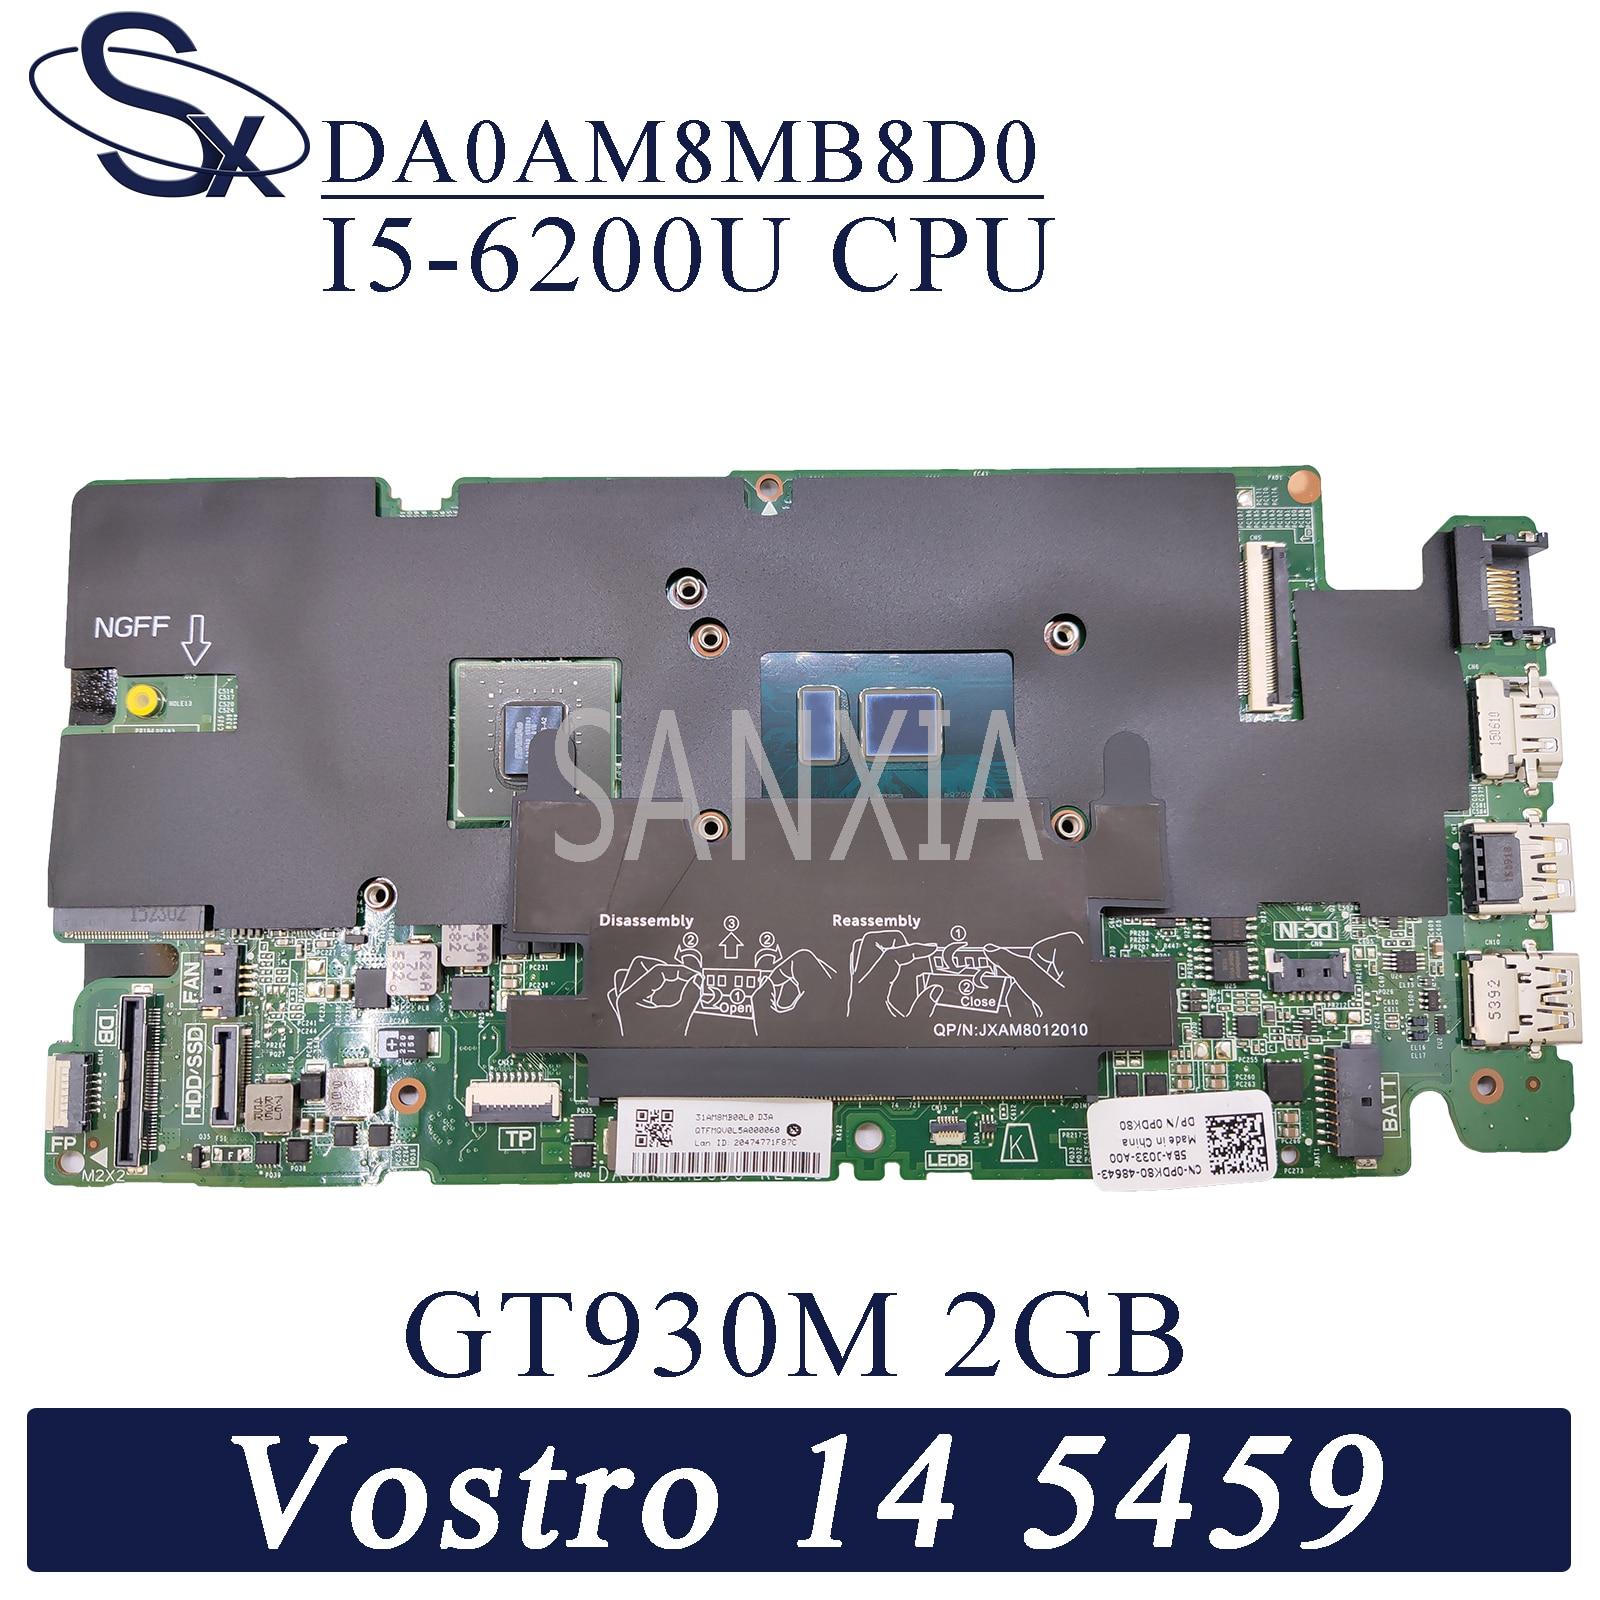 KEFU DA0AM8MB8D0 carte mère dordinateur portable pour Dell Vostro 14-5459 carte mère dorigine I5-6200U GT930M